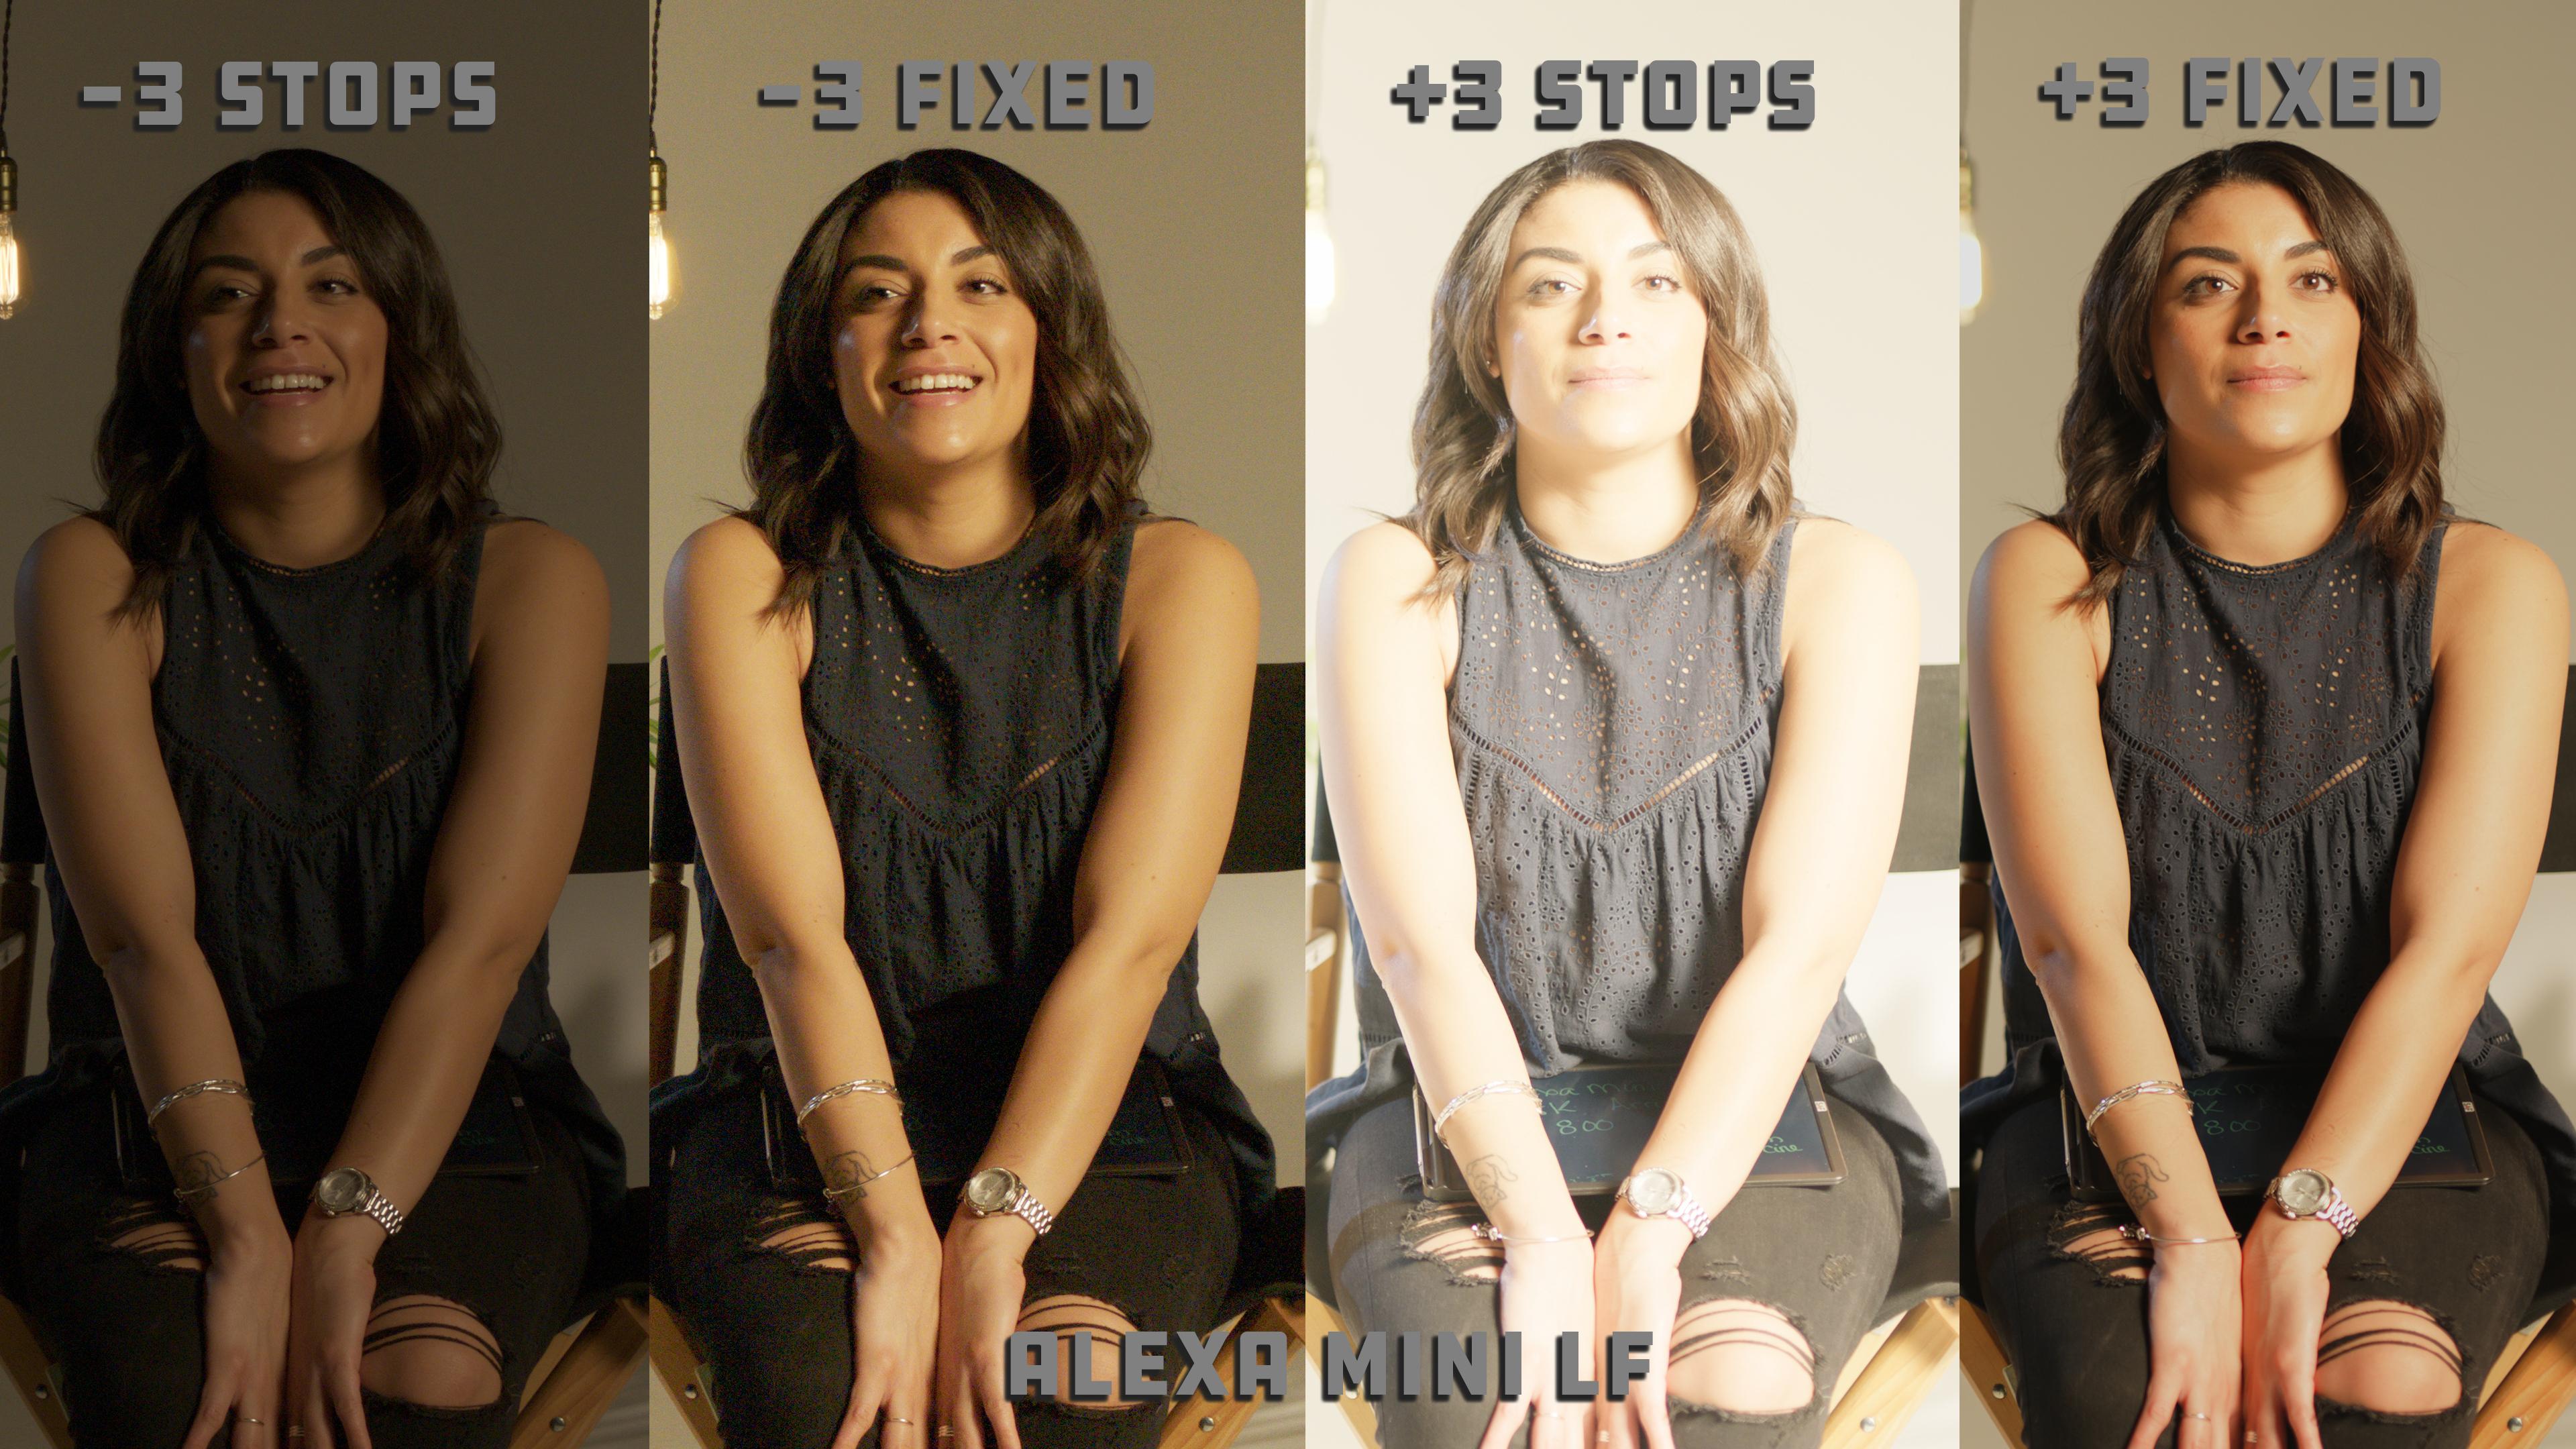 alexa_extremes_comp